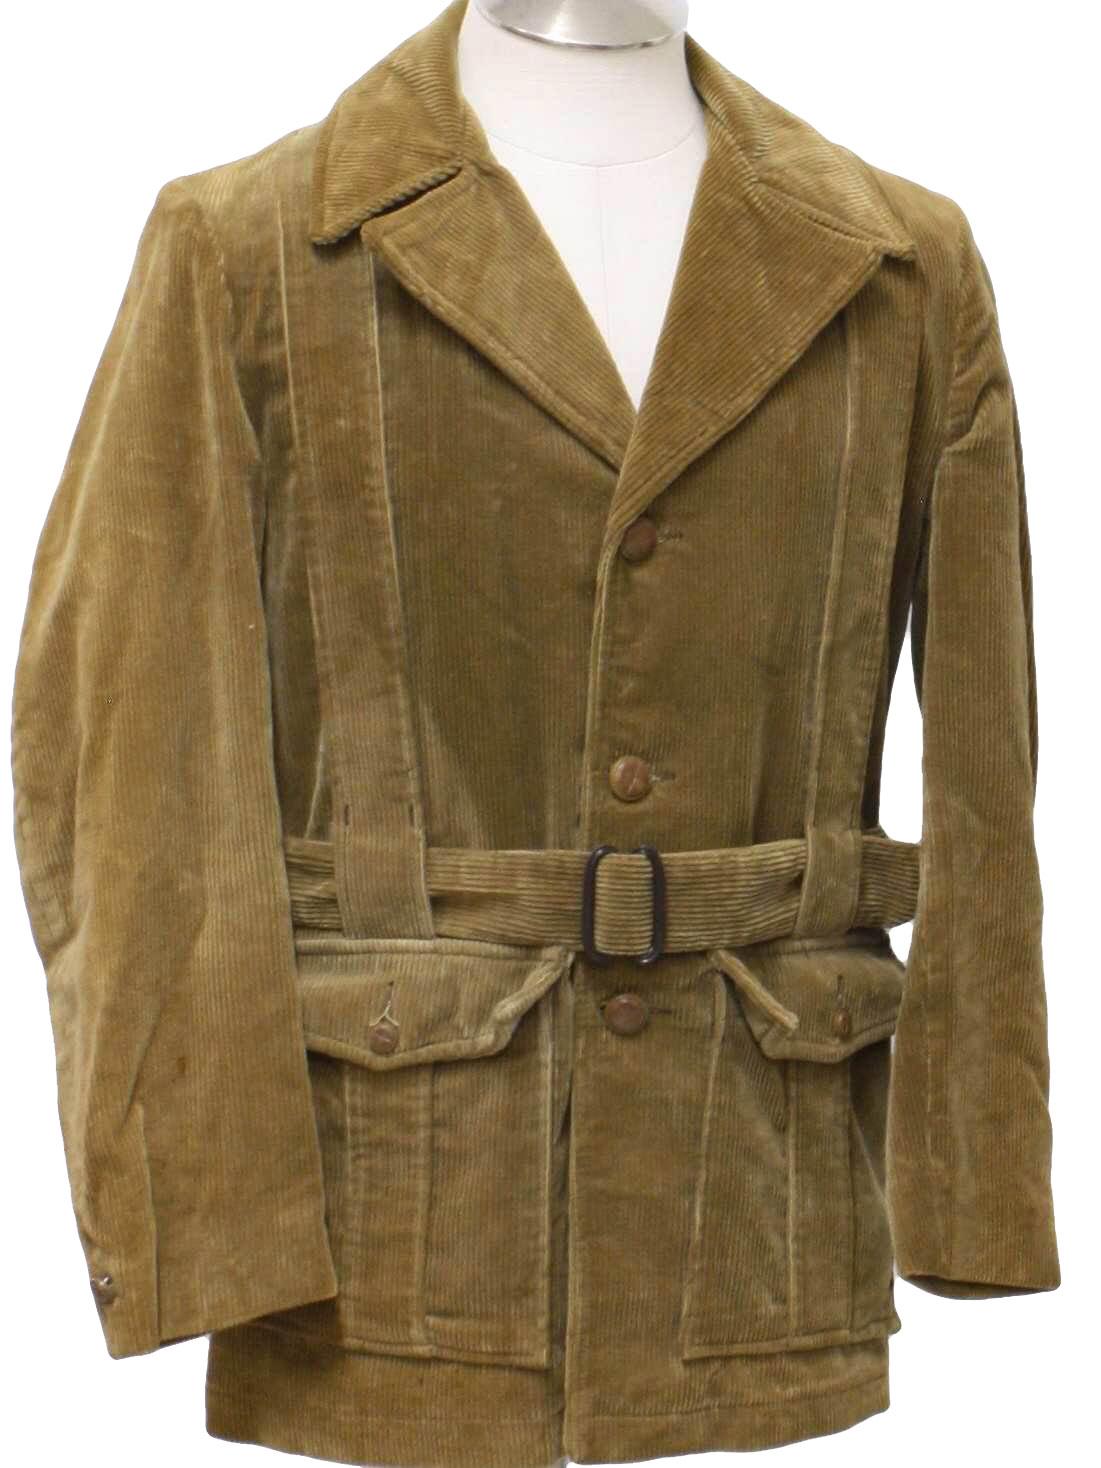 Sixties Vintage Jacket Late 60s Montgomery Ward Mens